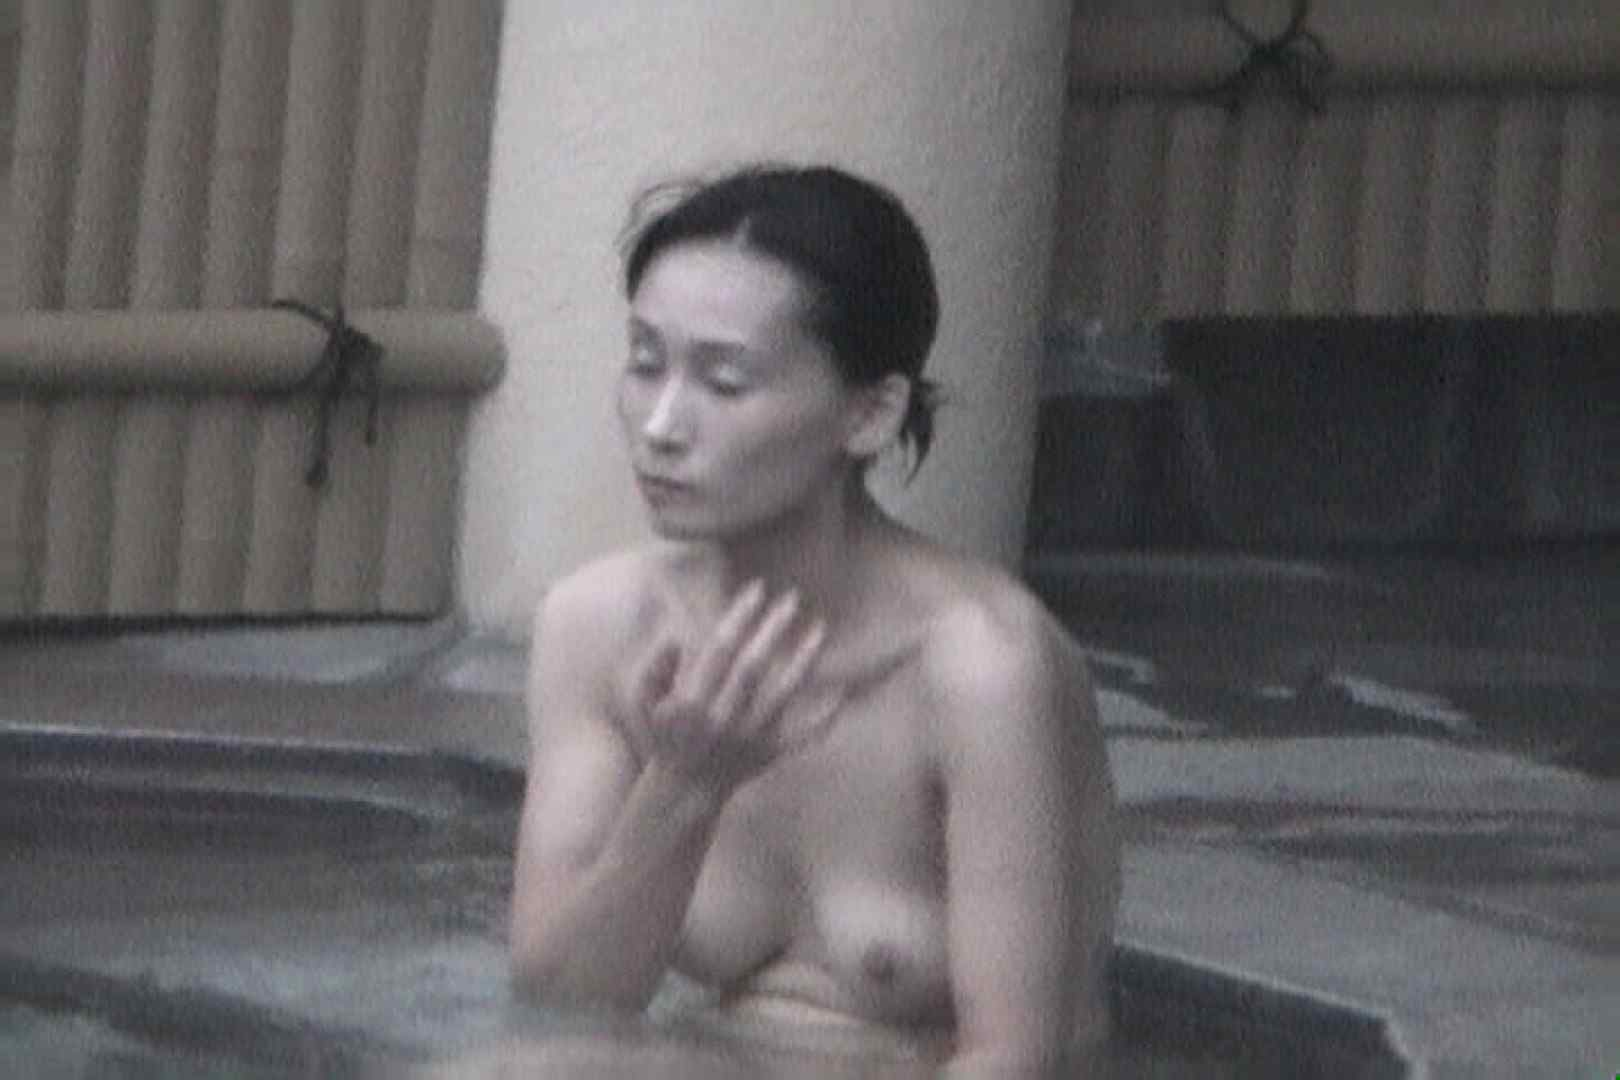 Aquaな露天風呂Vol.557 露天風呂編  100PIX 94